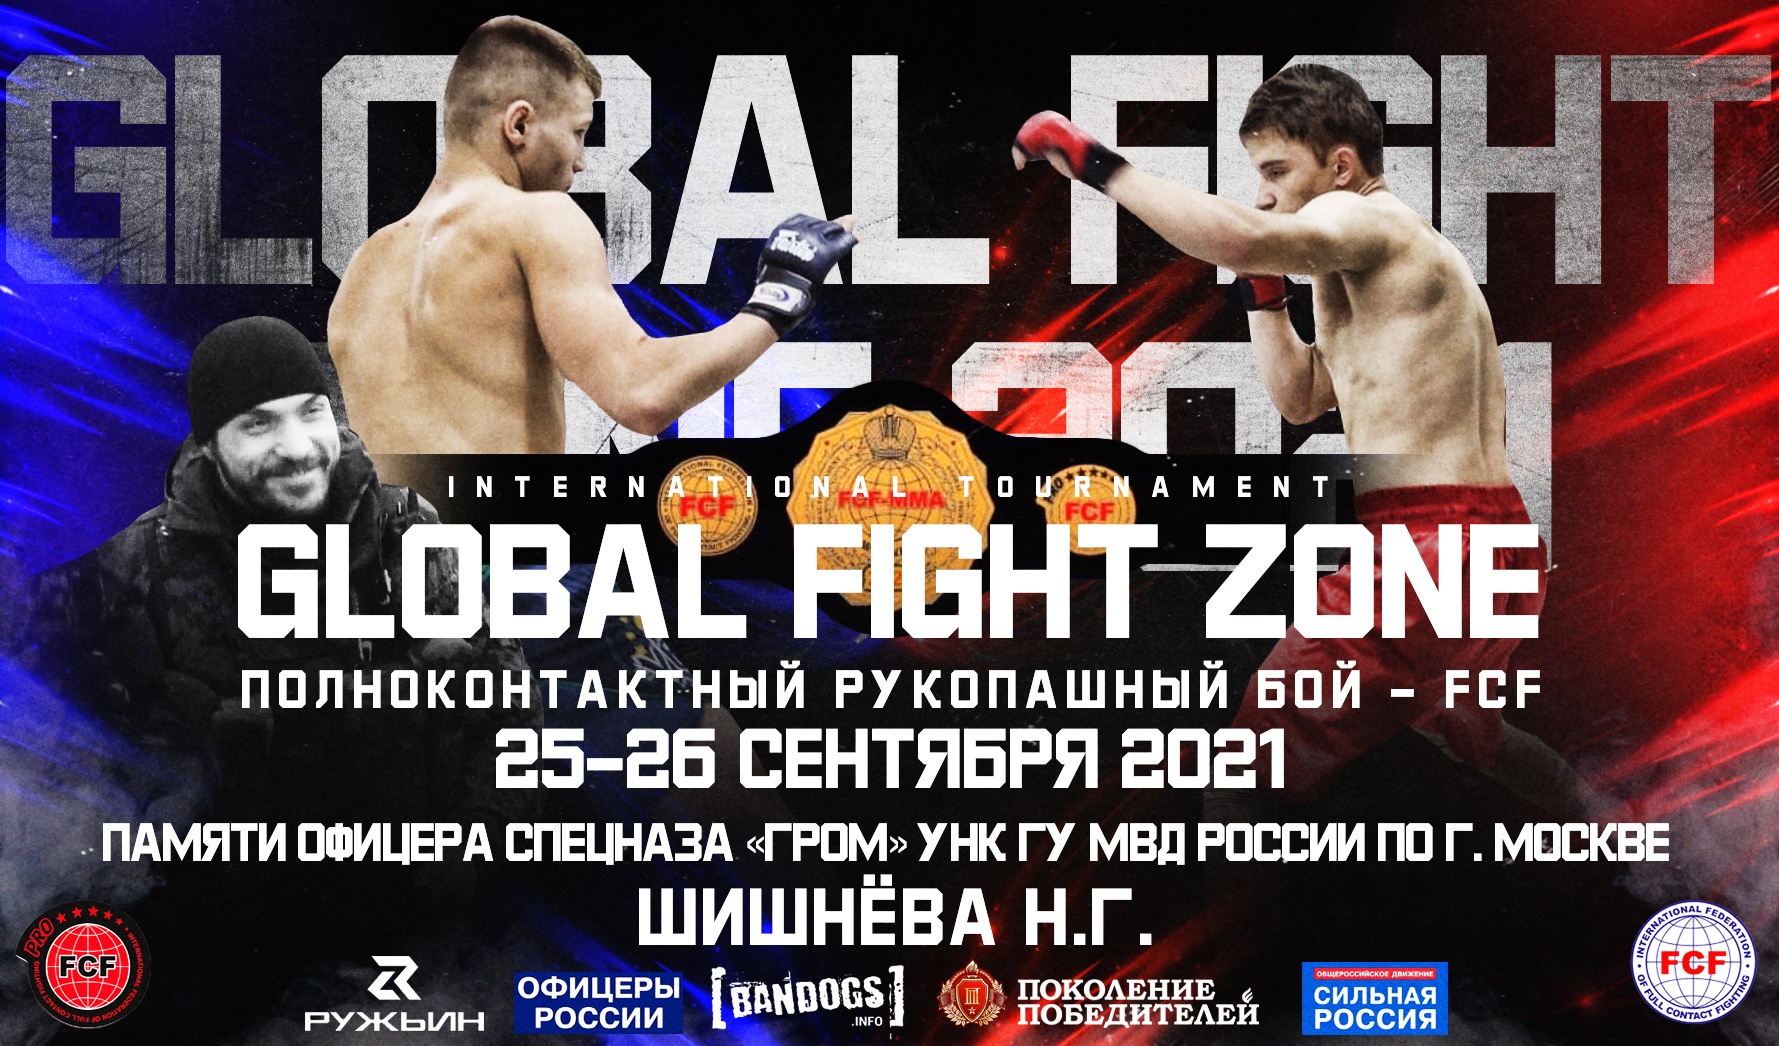 Международный Турнир «Global Fight Zone» по ПРБ FCF 2021